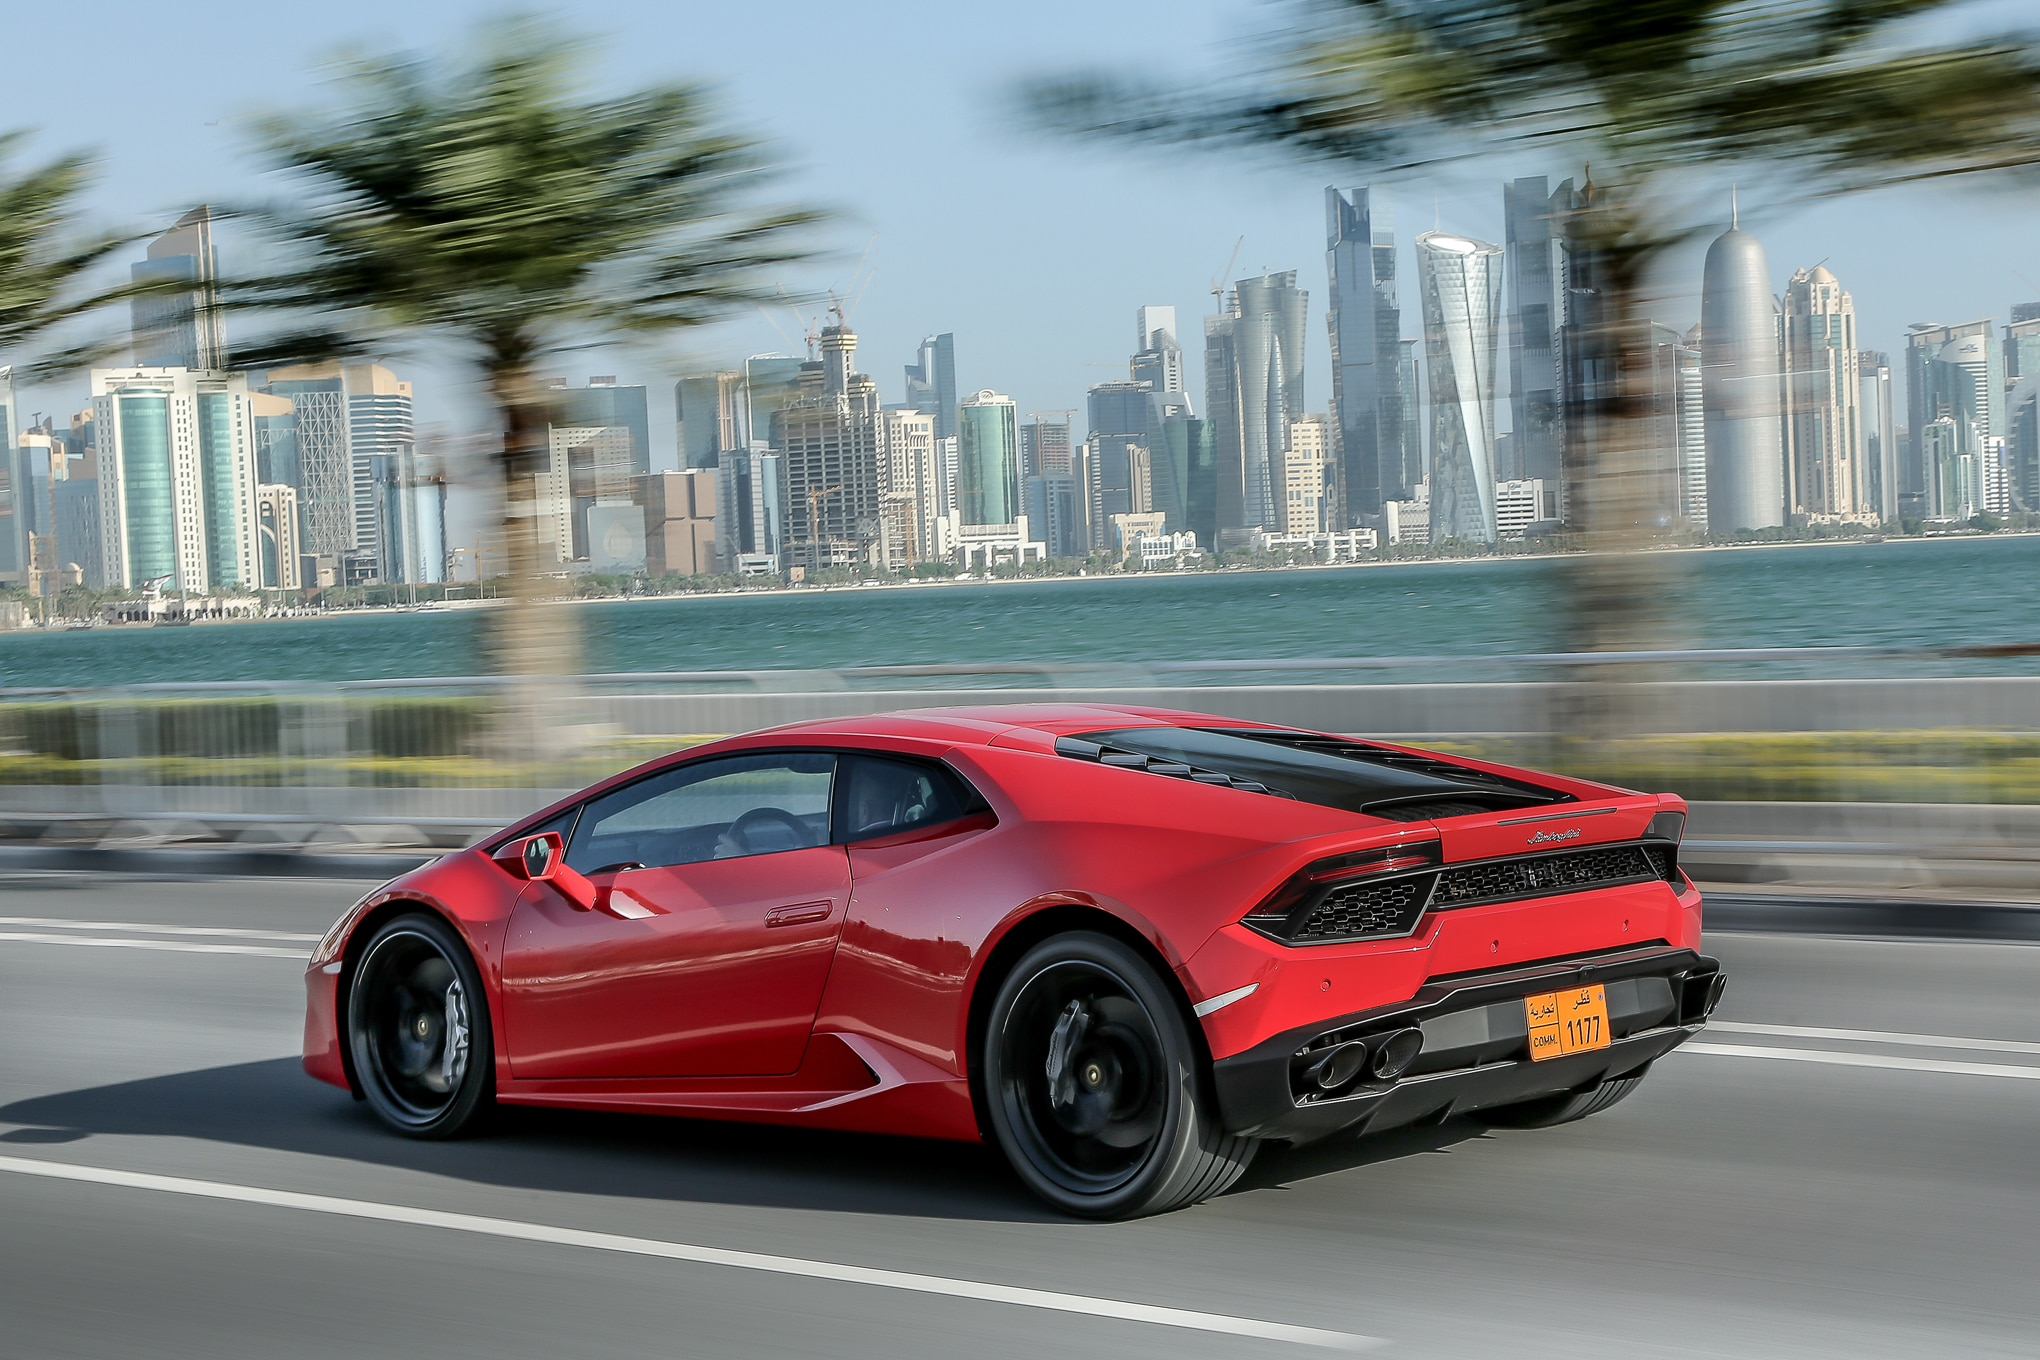 2016-Lamborghini-Huracan-LP580-2-rear-three-quarter-in-motion2 Marvelous Lamborghini Huracan Price In Uae Cars Trend